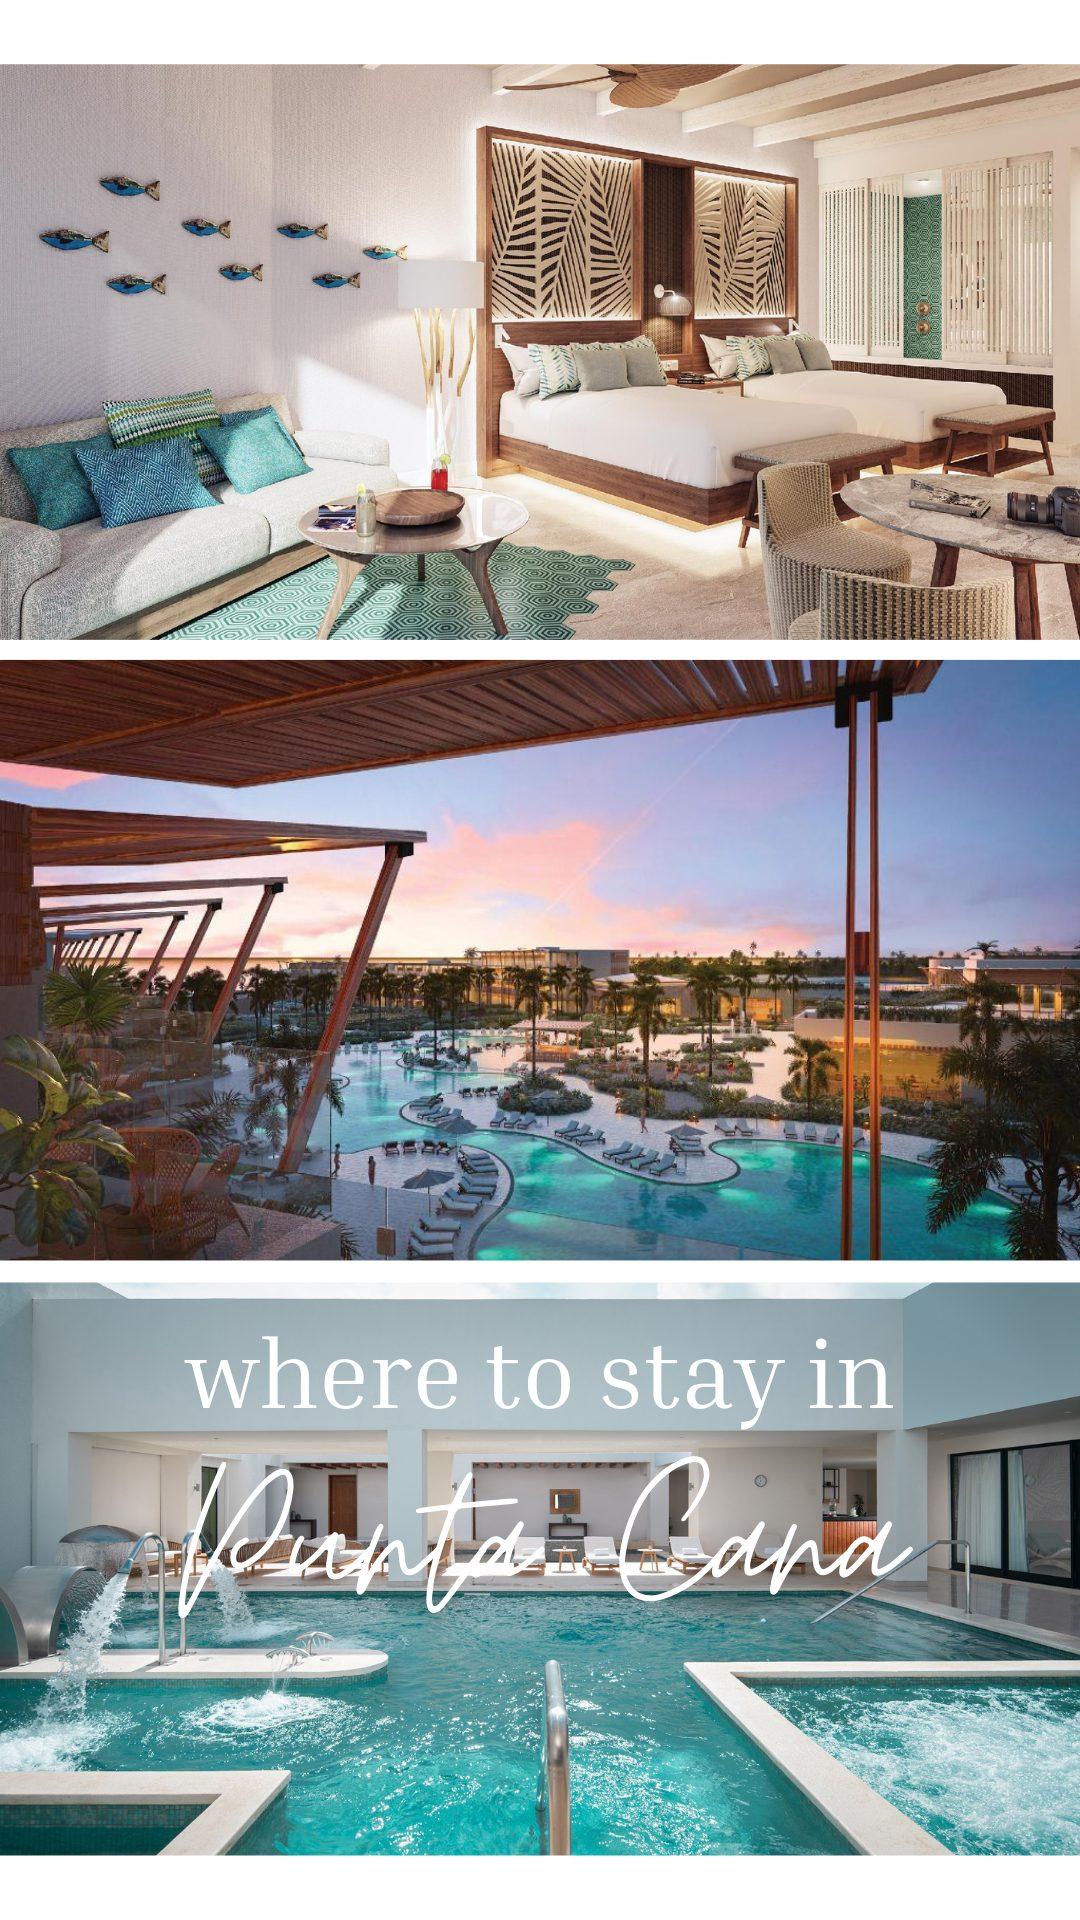 Dreams Macao Resort Family Friendly all inclusive punta cana dominican republic